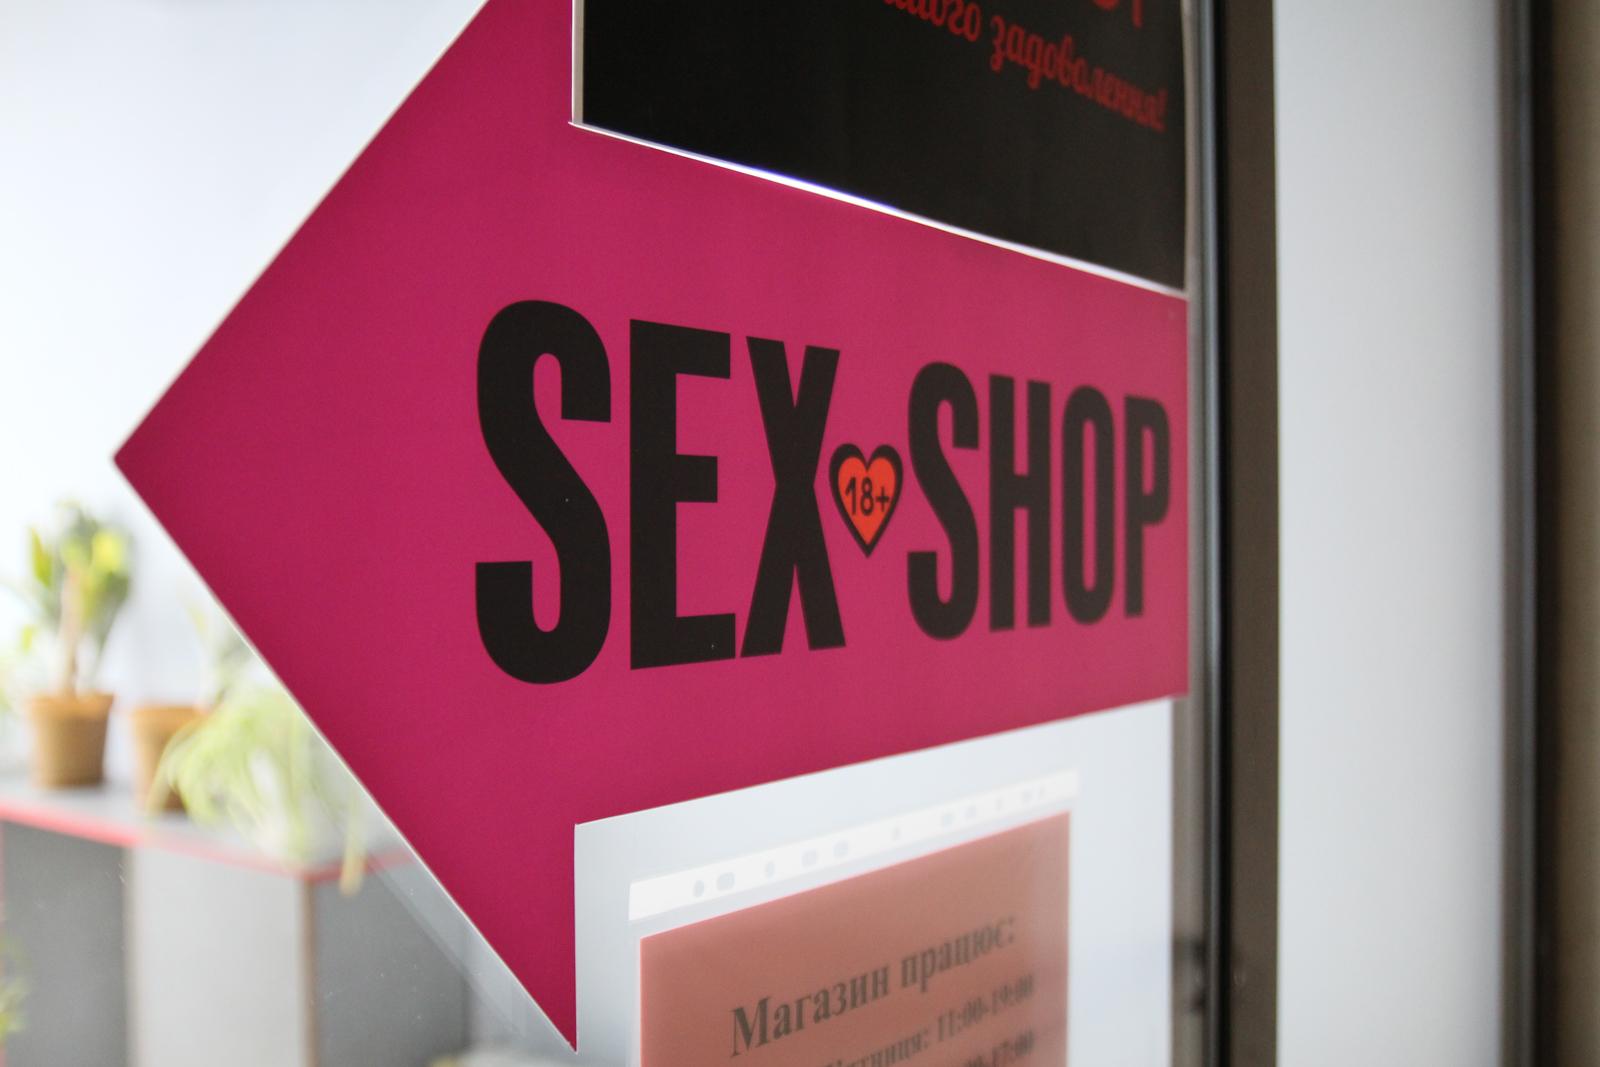 sex chop